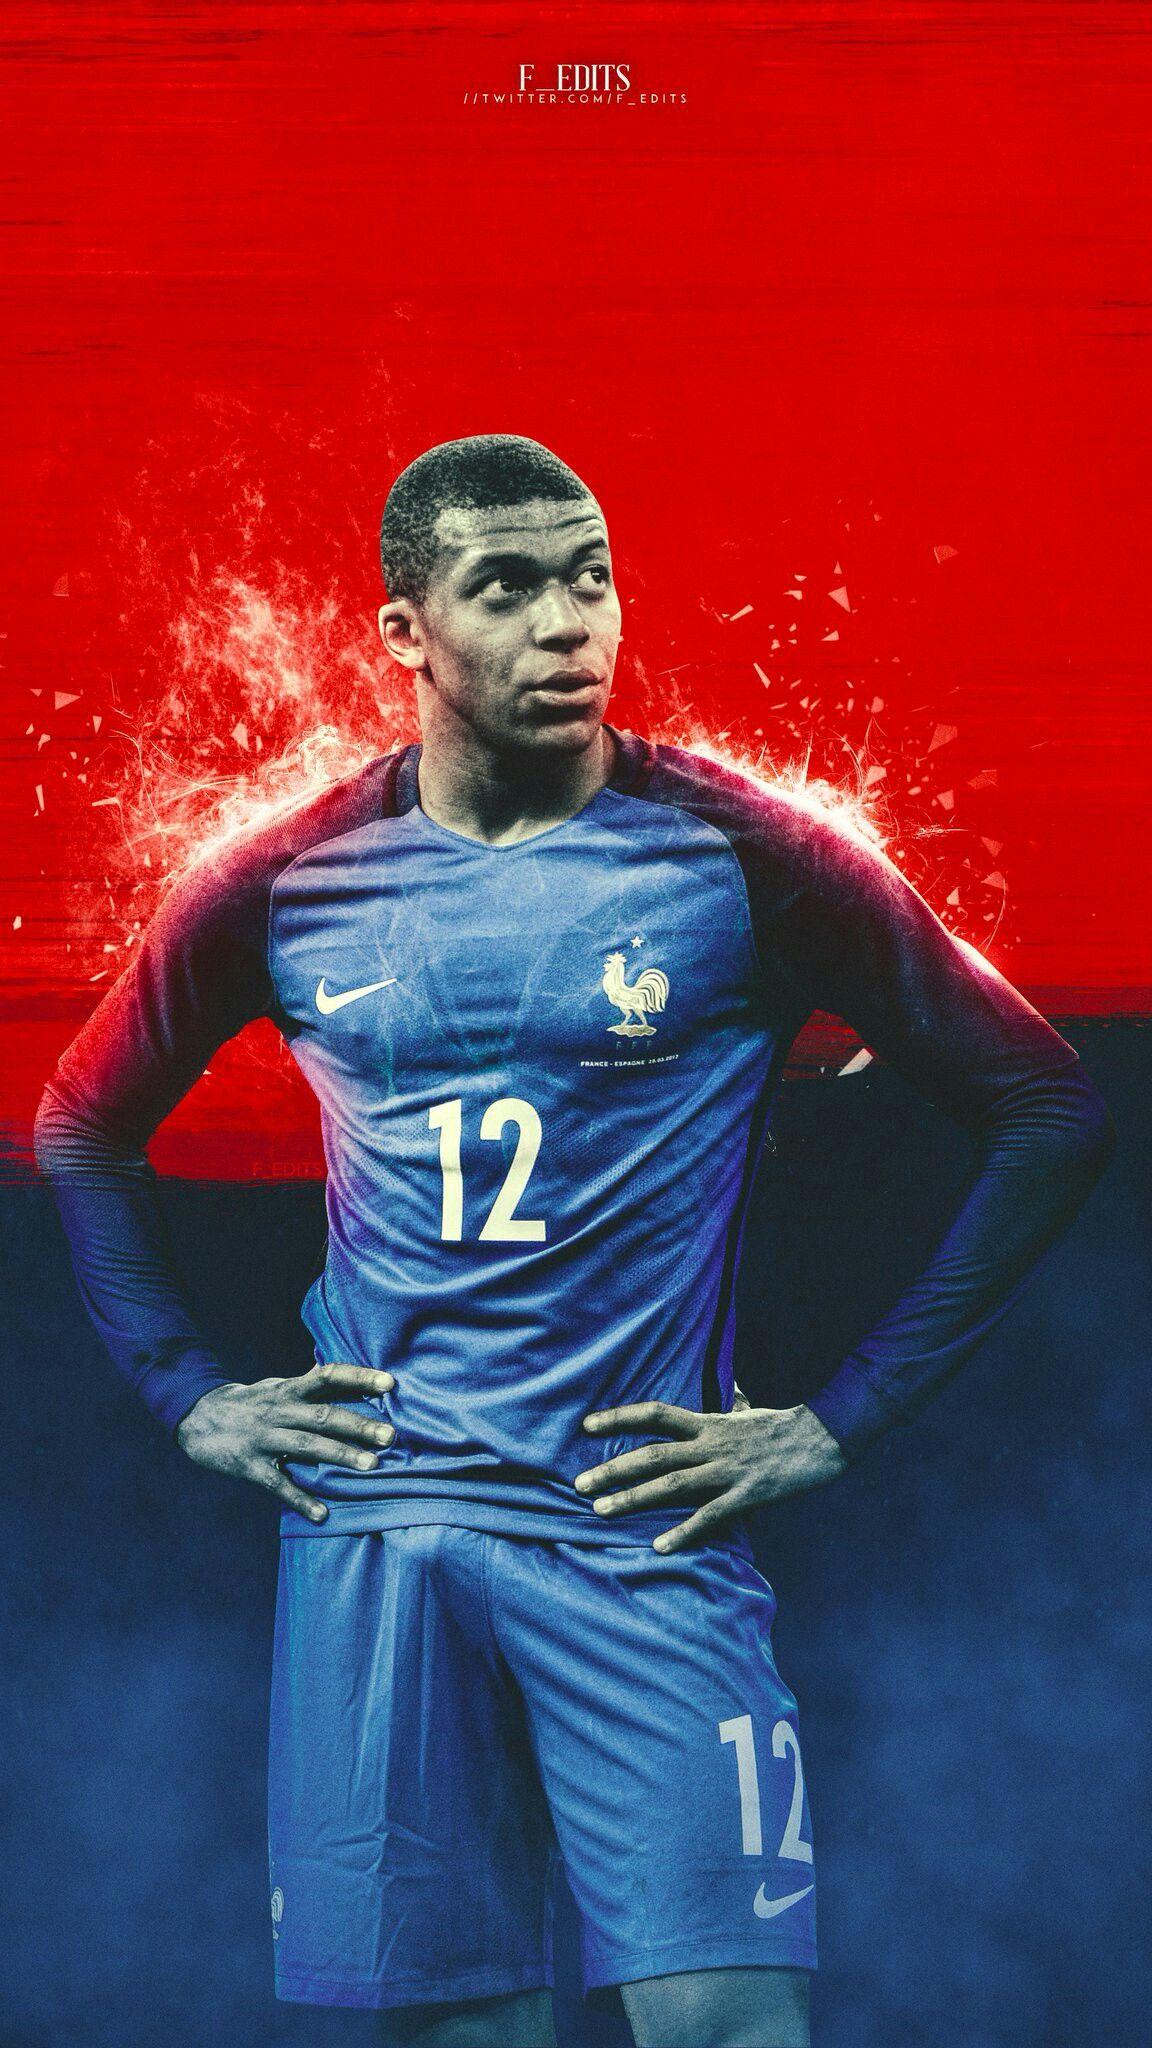 926d3e620 Kylian Mbappé France Best Football Players